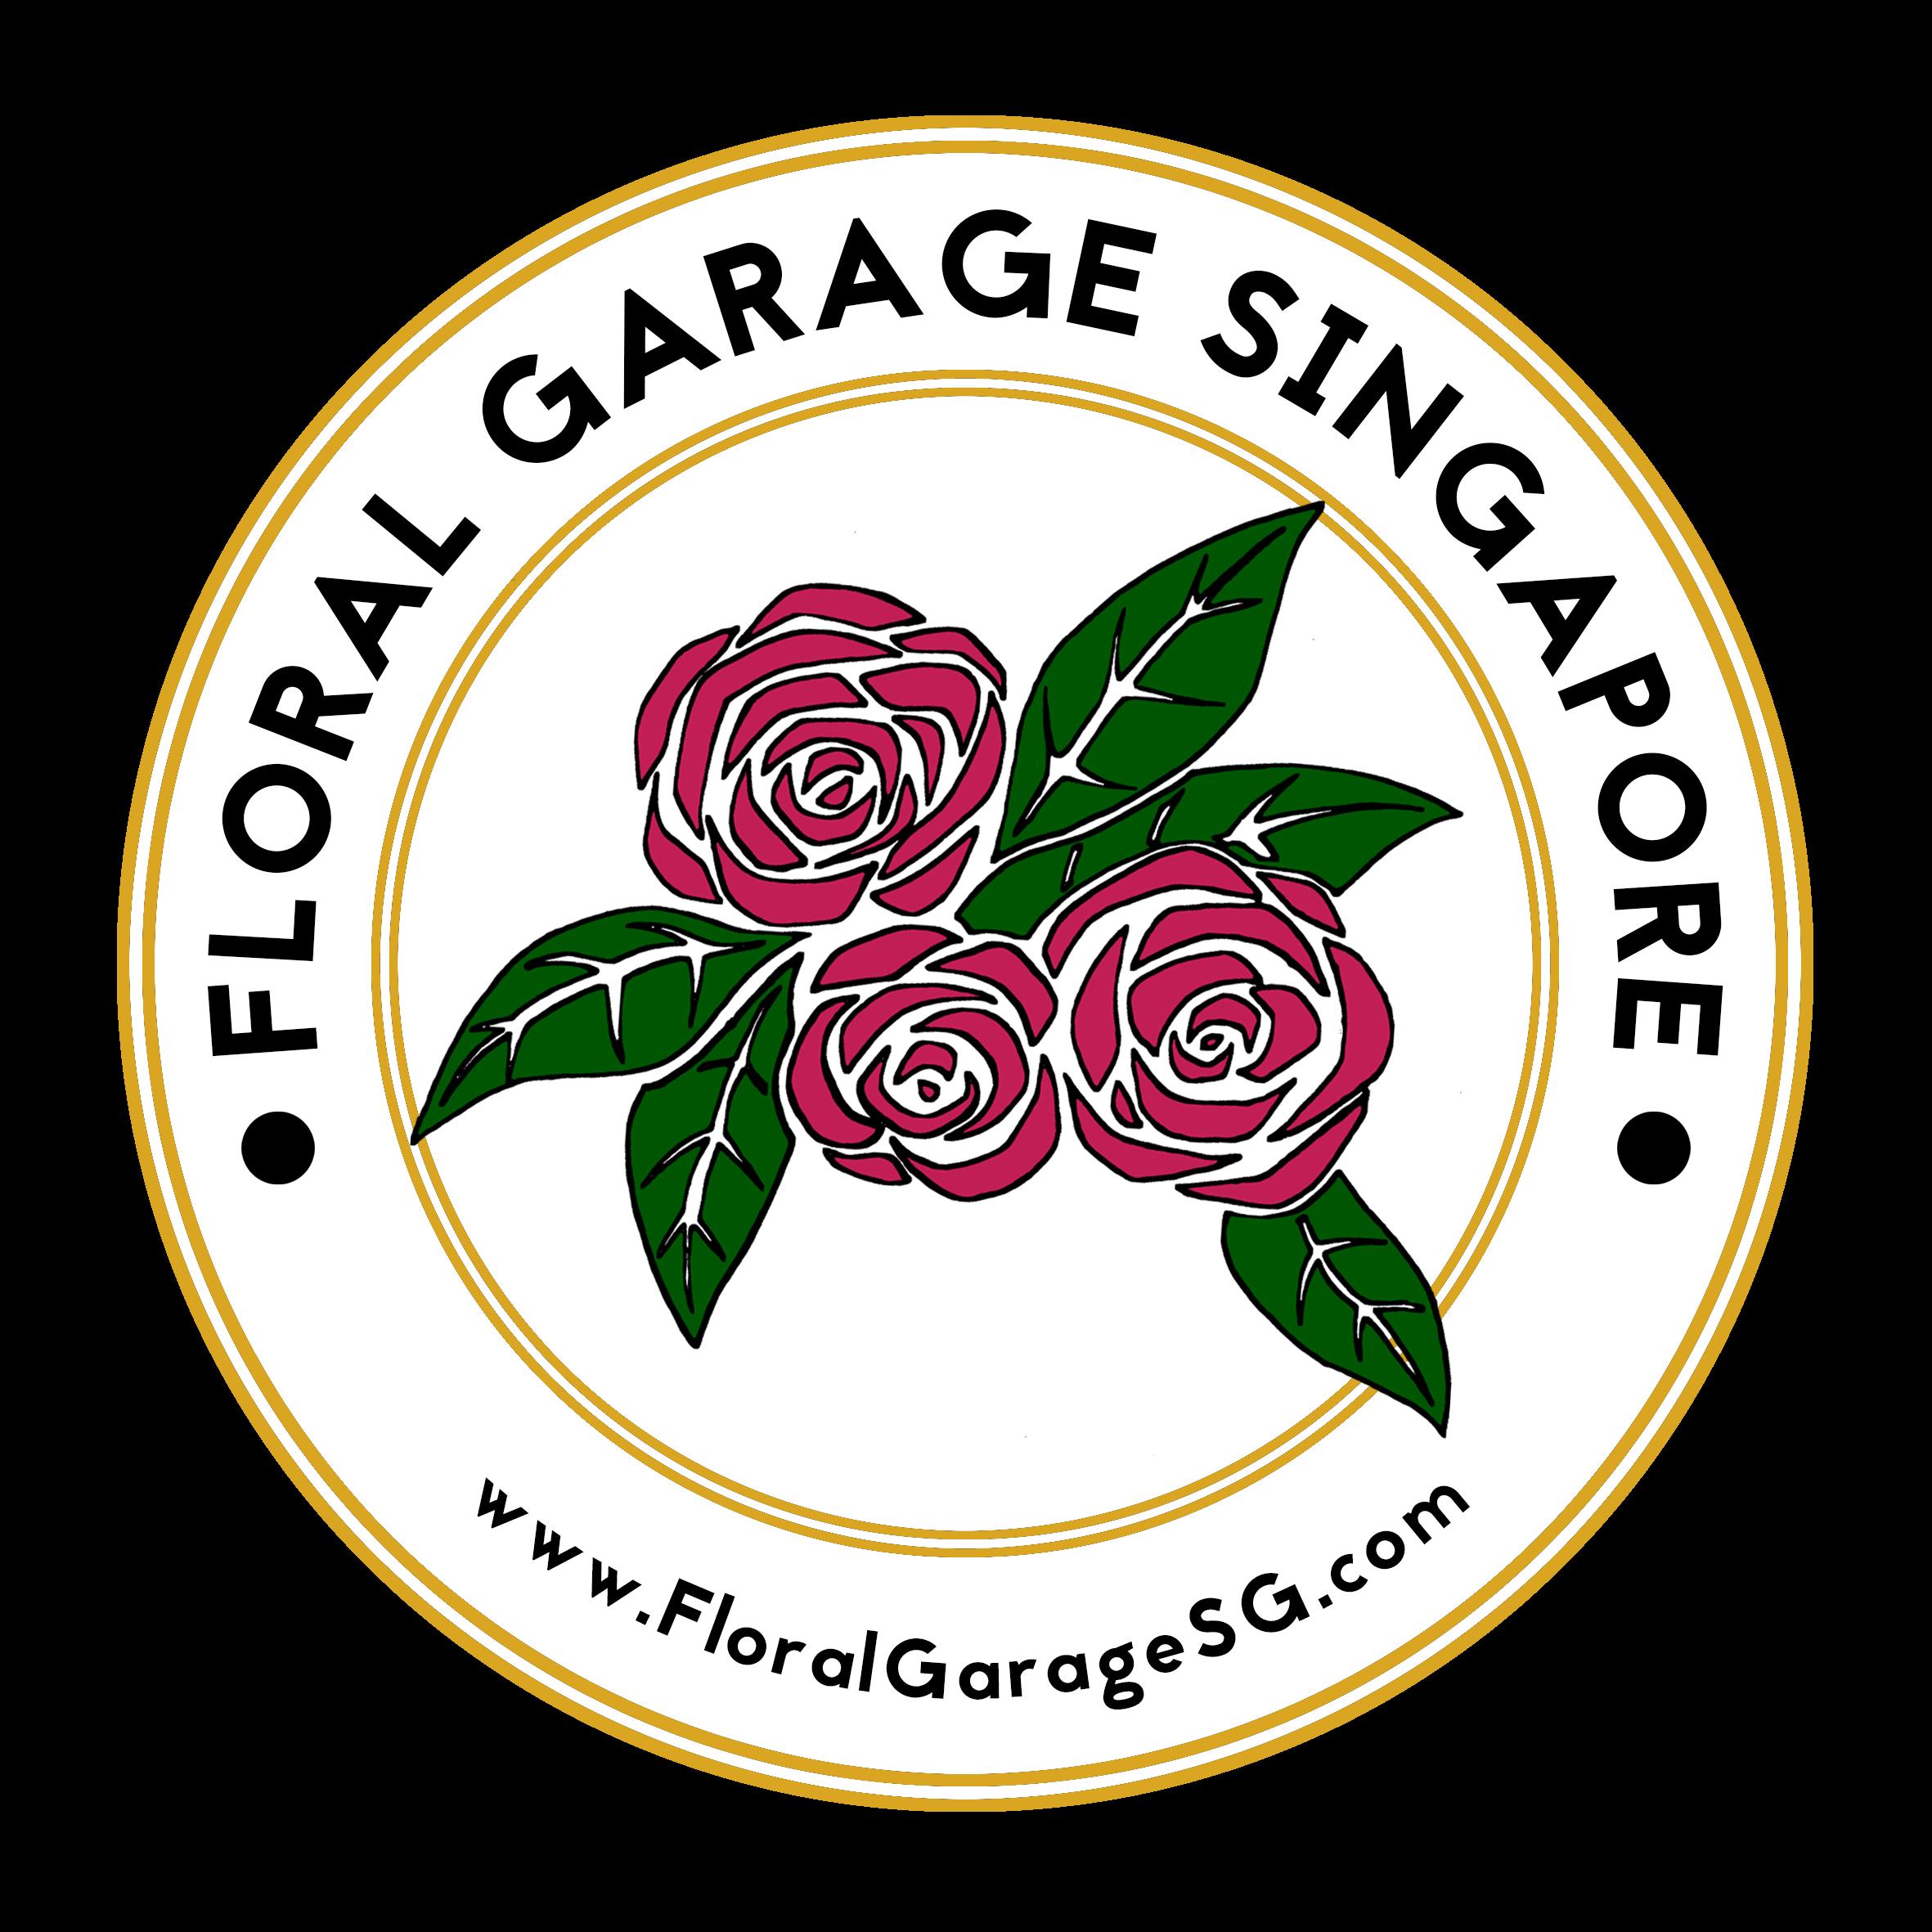 FLORAL GARAGE SG